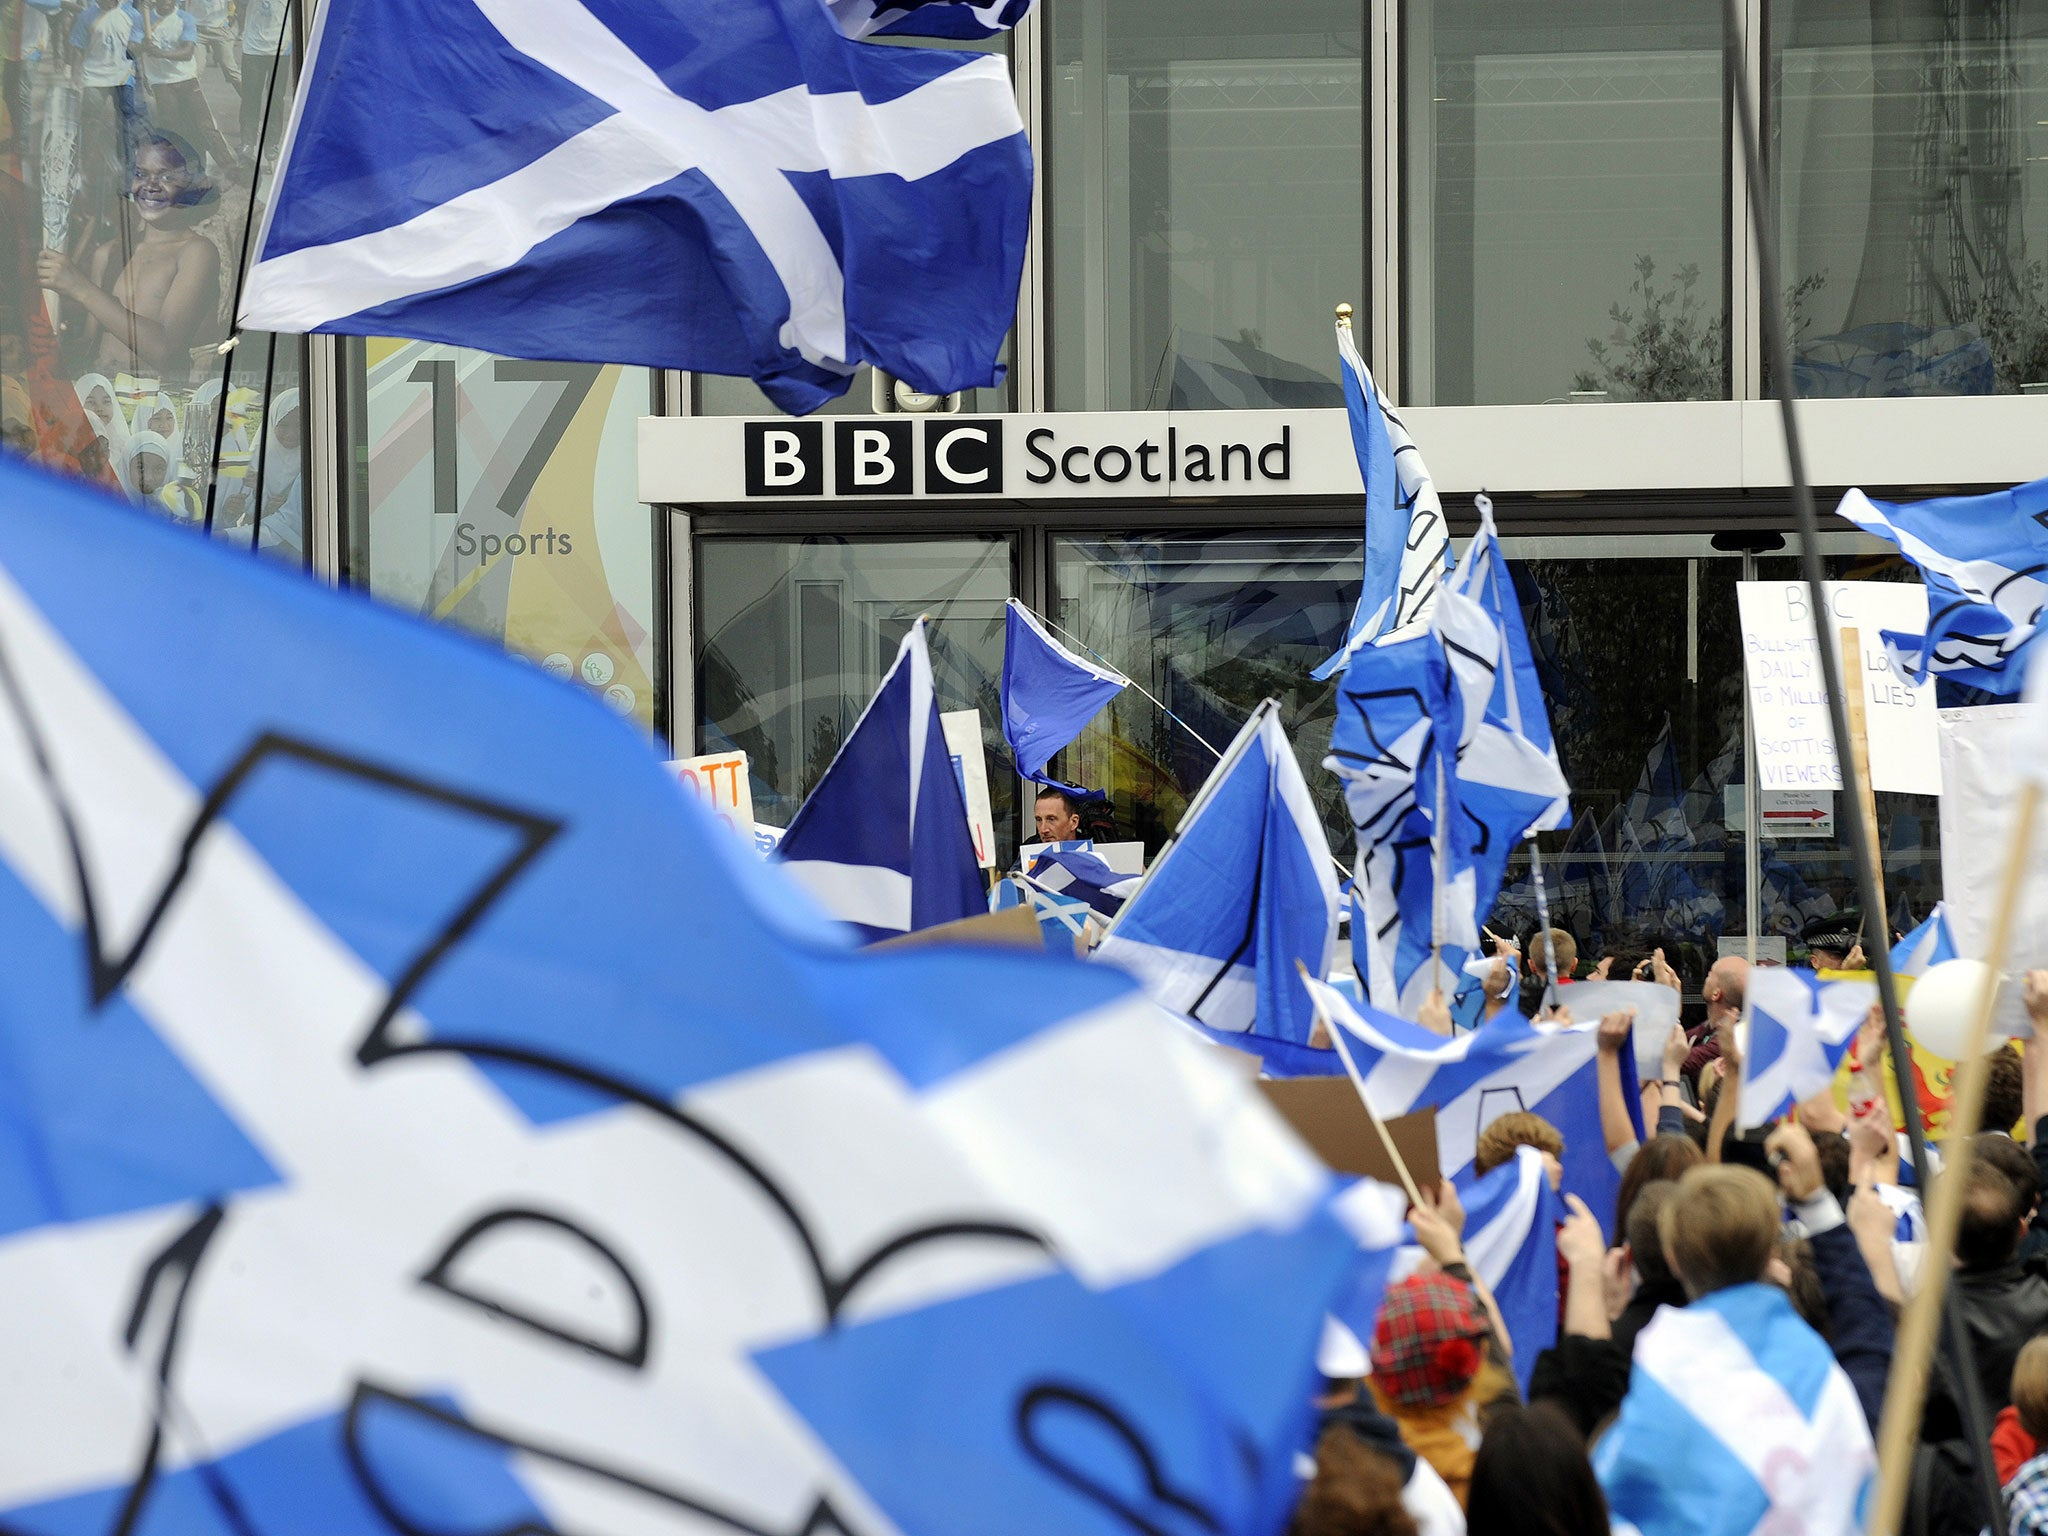 bbc scotland - photo #42